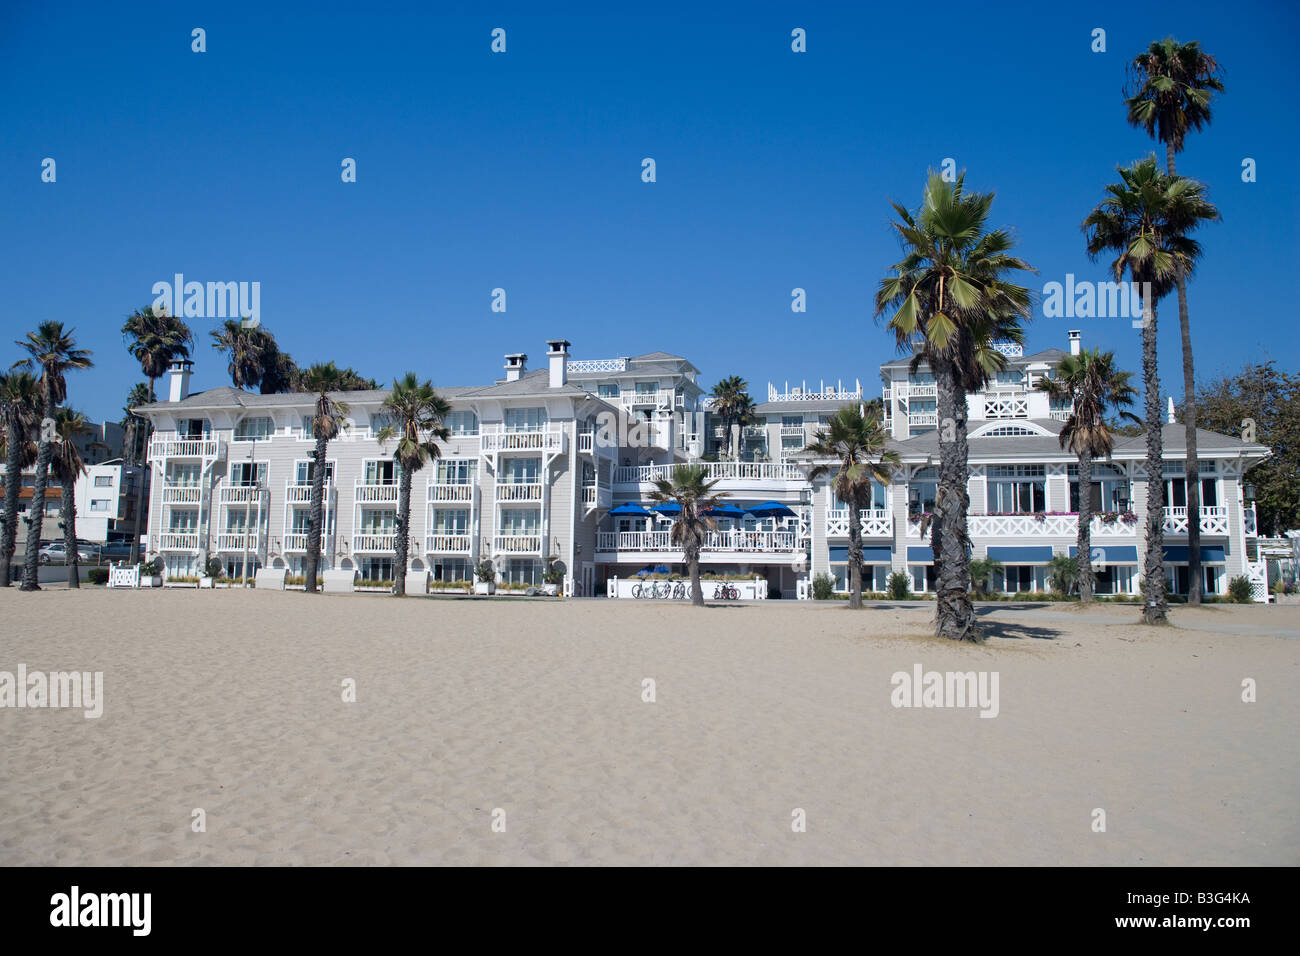 Shutters On The Beach Hotel Santa Monica Beach Los Angeles California Stock Photo Alamy